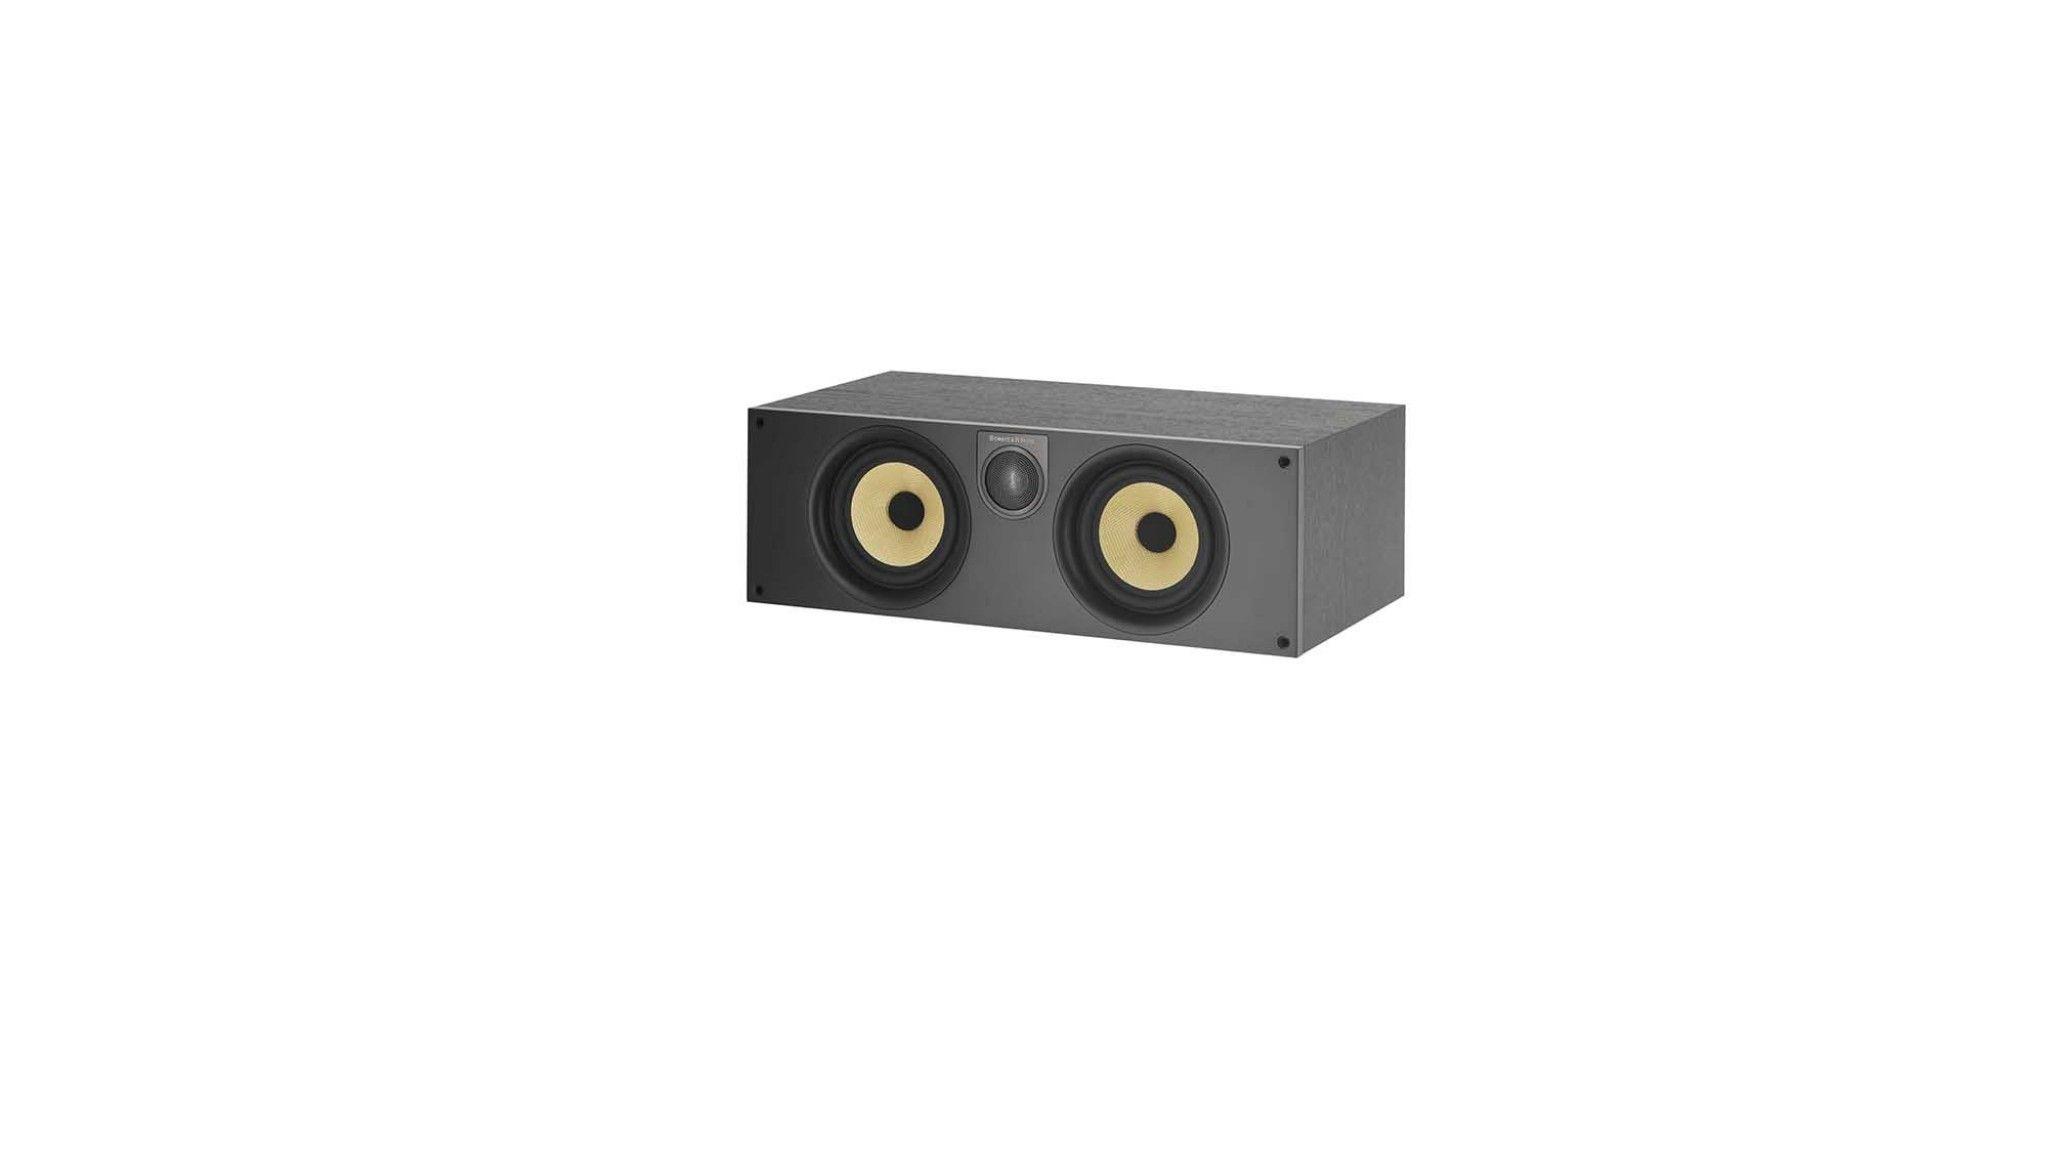 Bw htm62 ashford kent smart home hifi audio